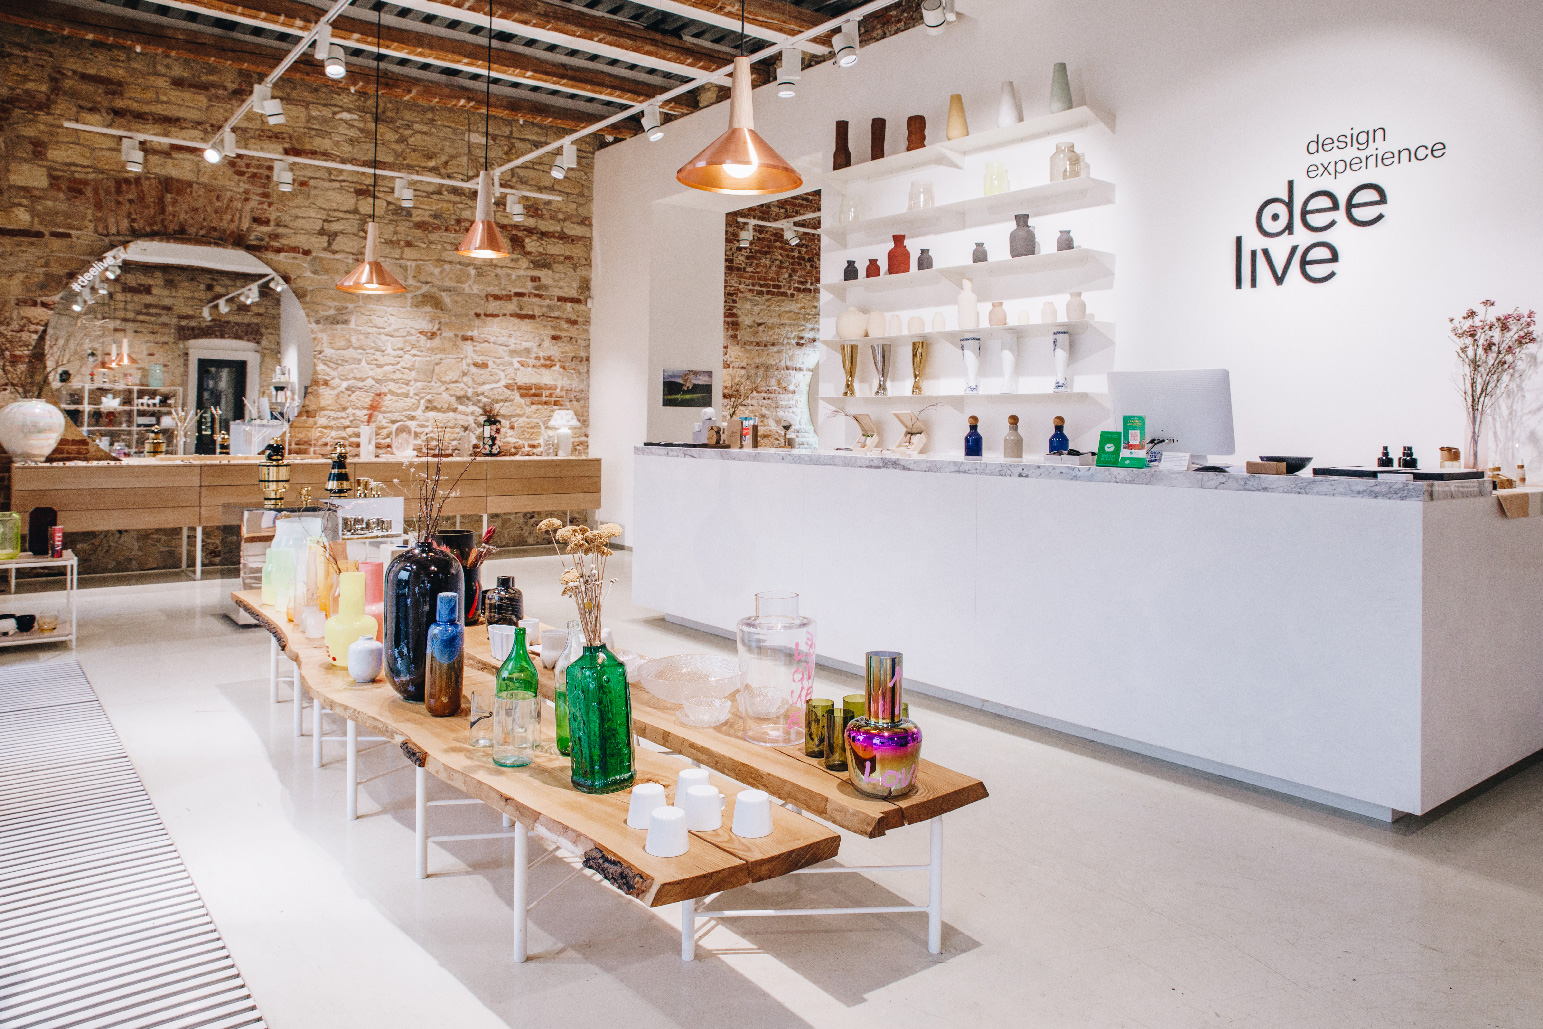 interiér deelive design store